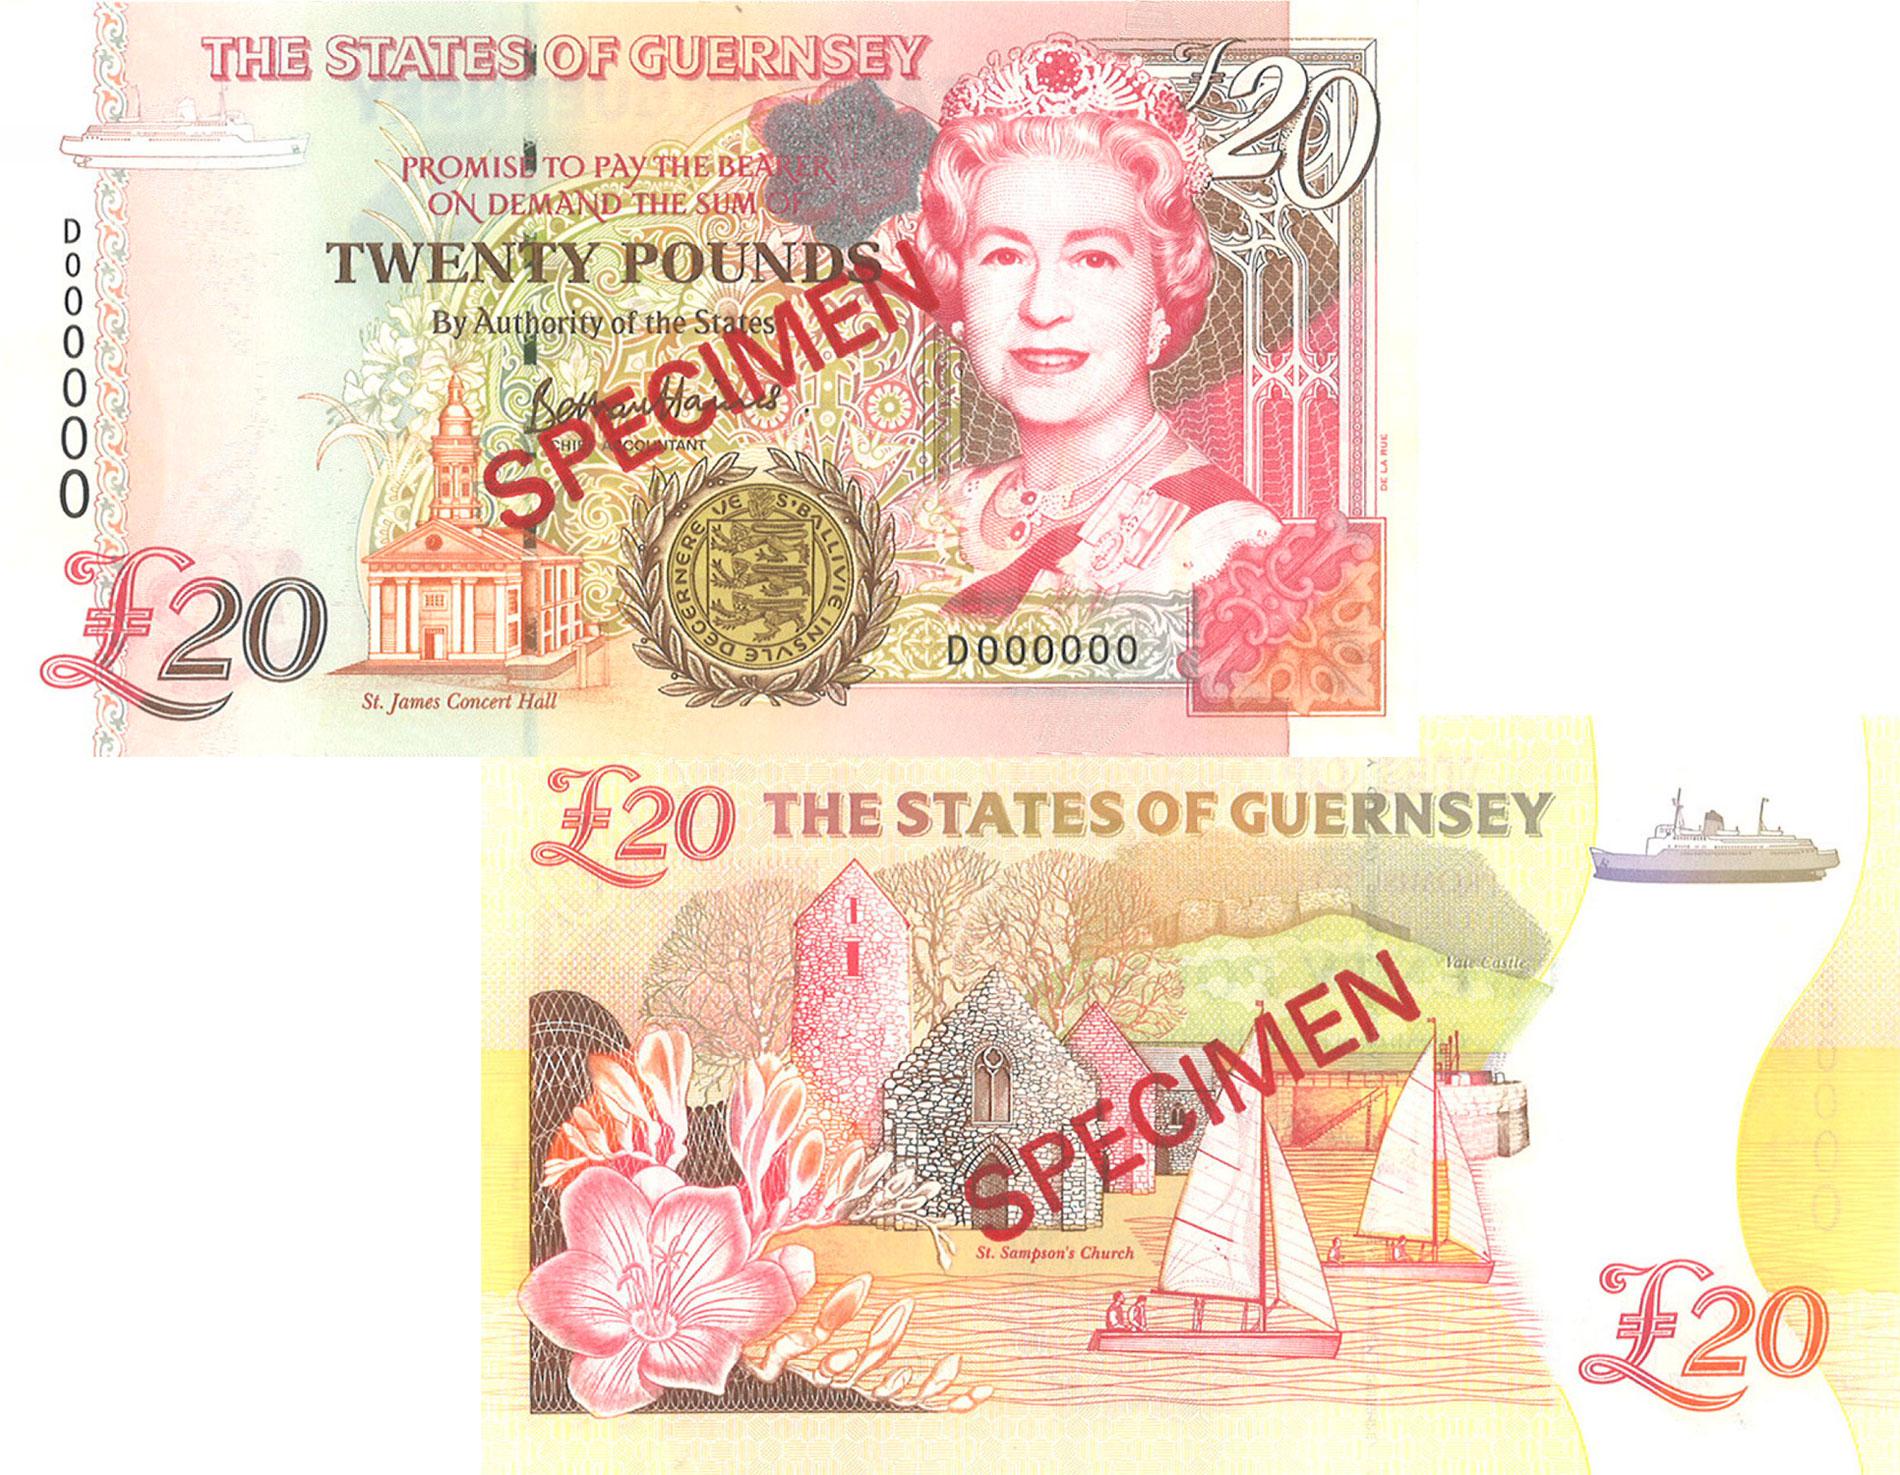 £20 'D' Prefix - B. Haines signatory Guernsey Bank Note